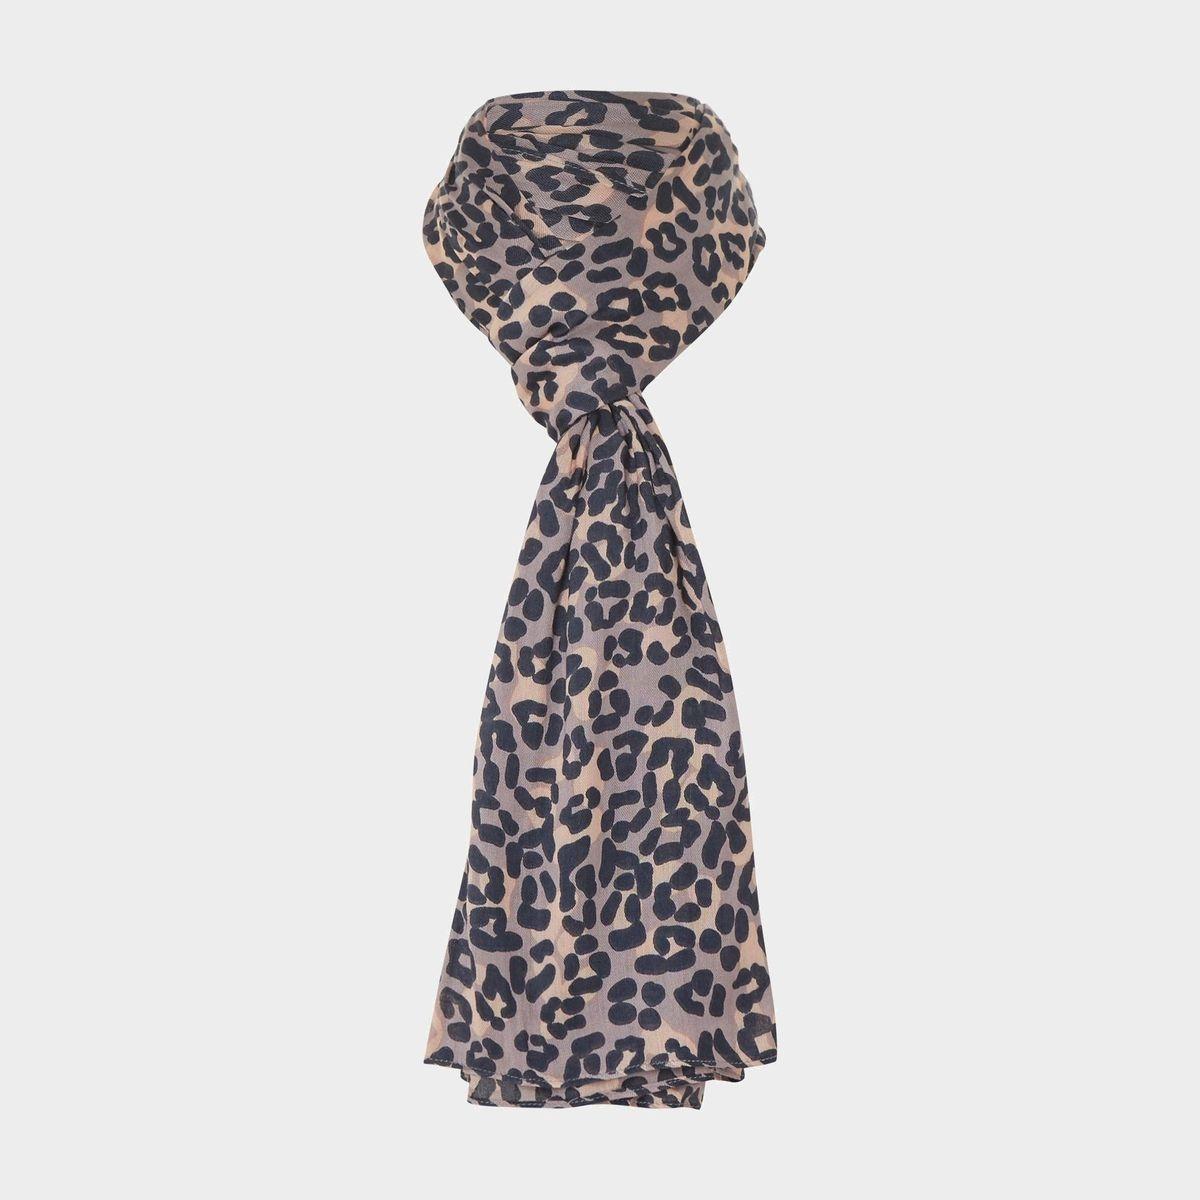 Foulard à imprimé léopard - LAYLLA